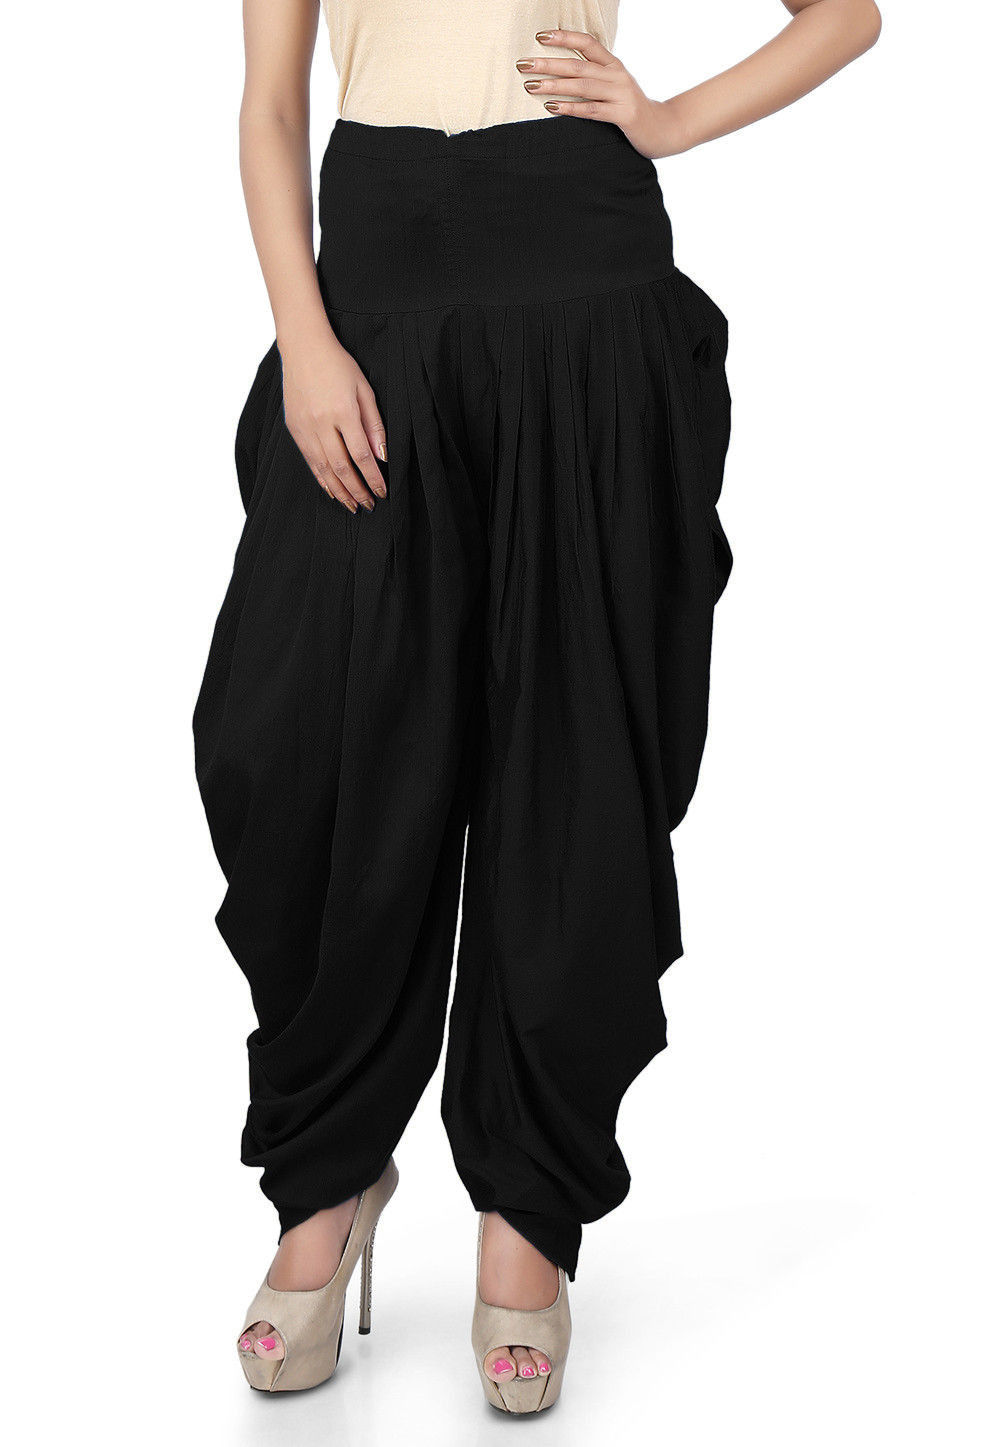 Solid Color Cotton Silk Salwars in Black